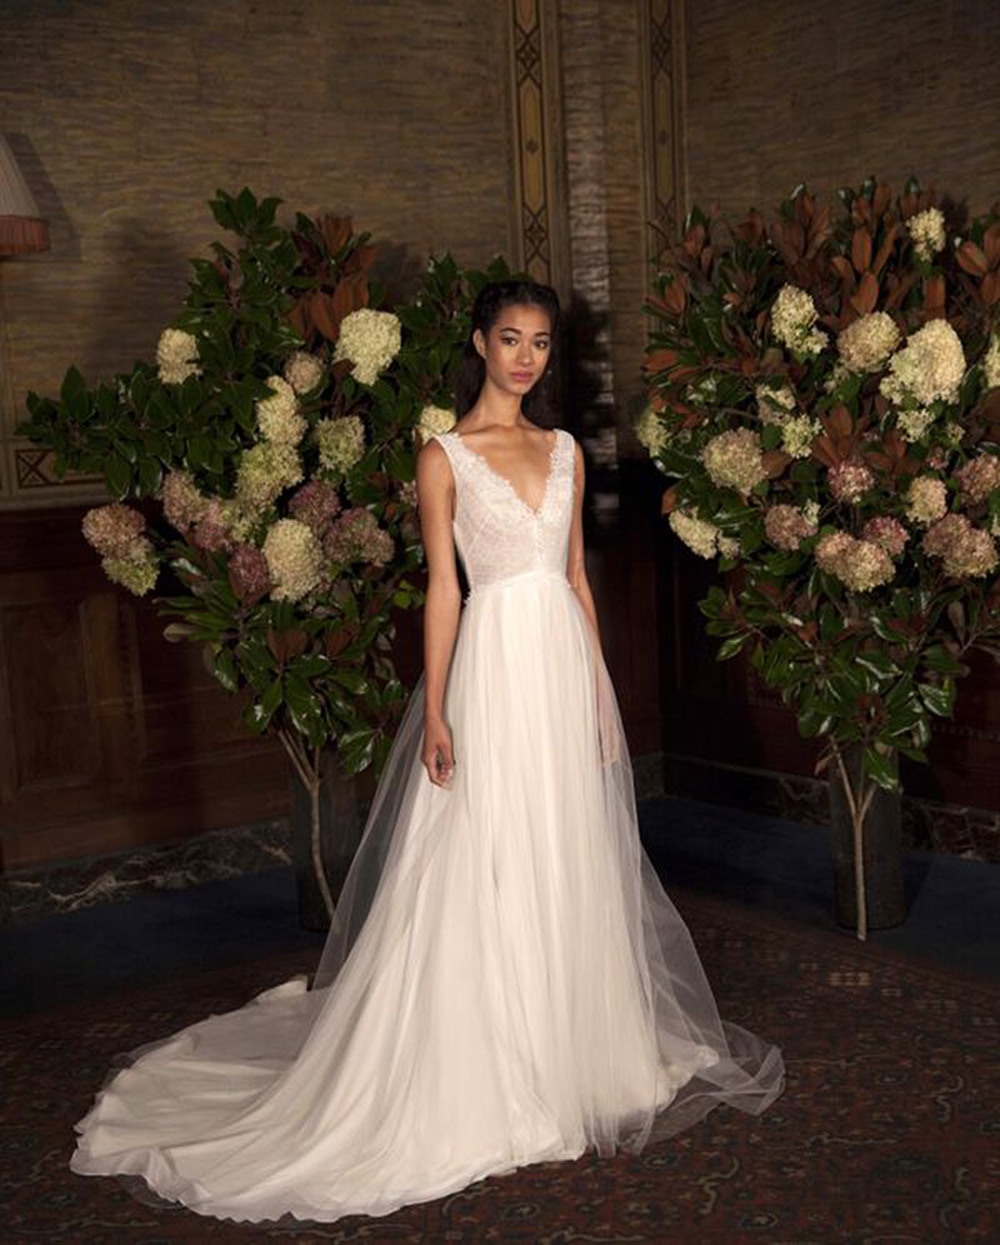 Austin Scarlett Wedding Gowns: Bridal Collection